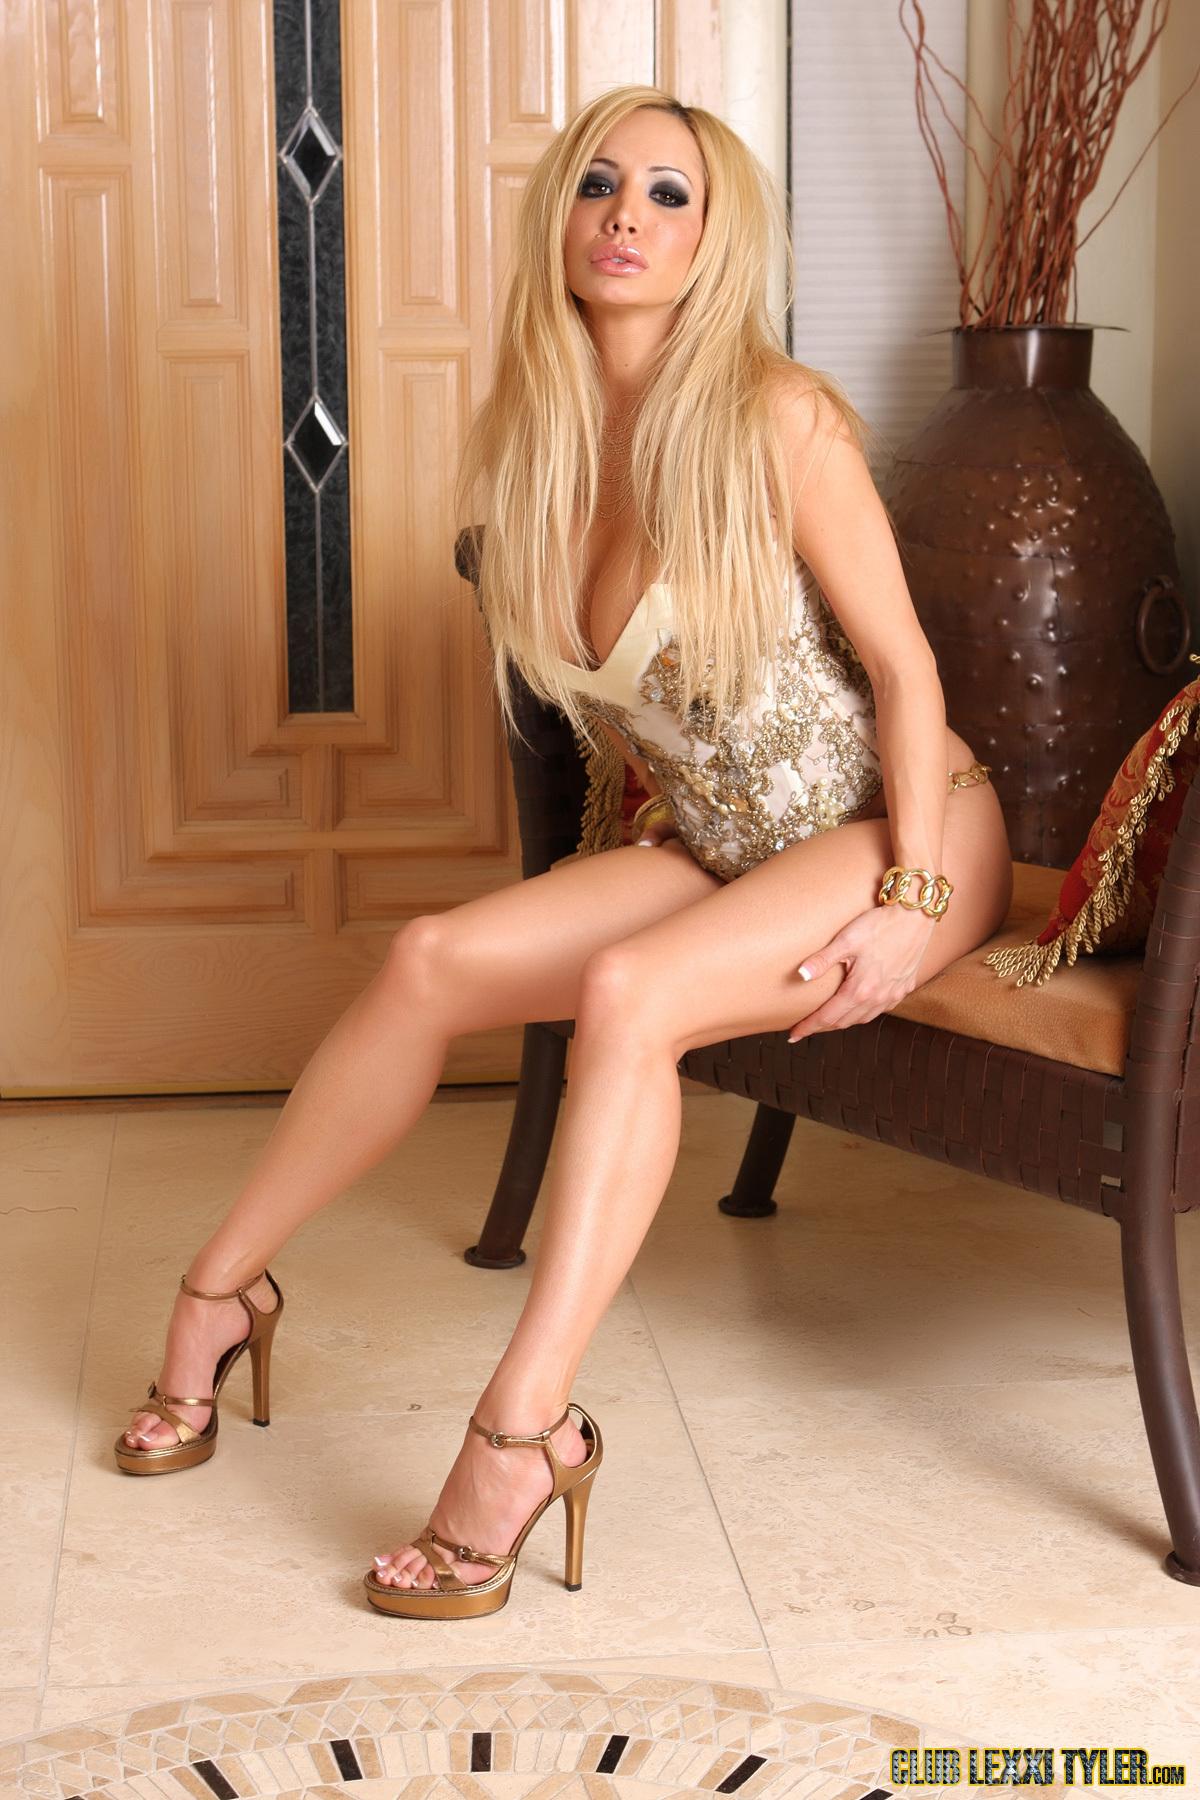 Naked pictures of kyla pratt